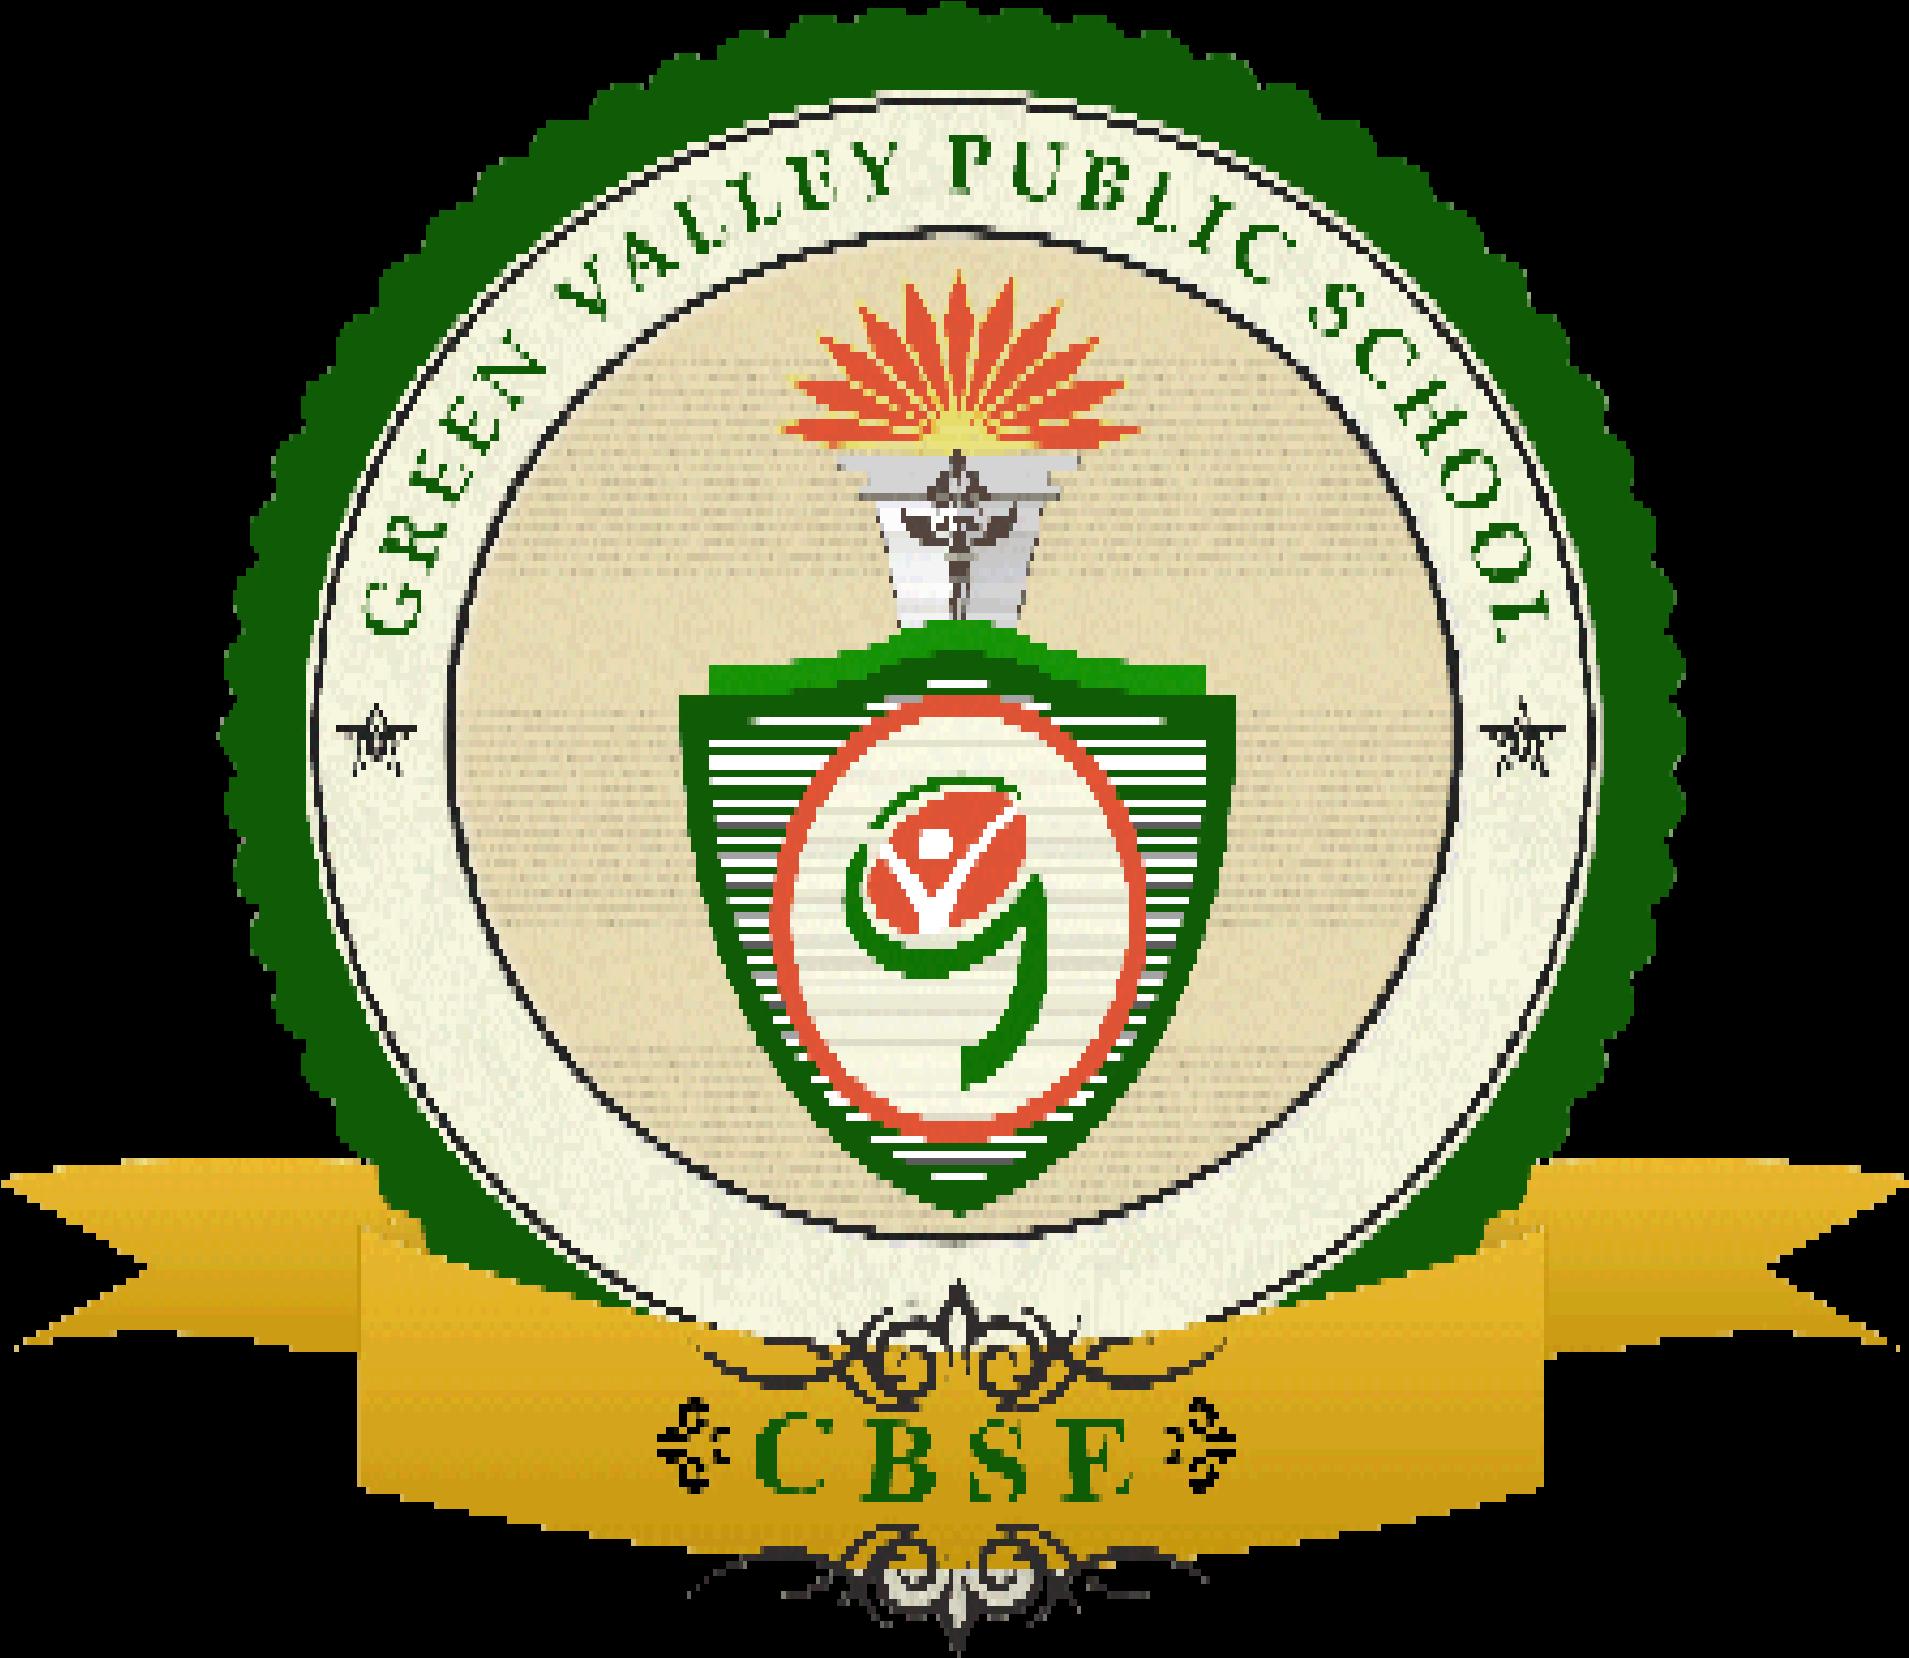 Summer Class - Green Valley Public School Clipart (3000x2300), Png Download